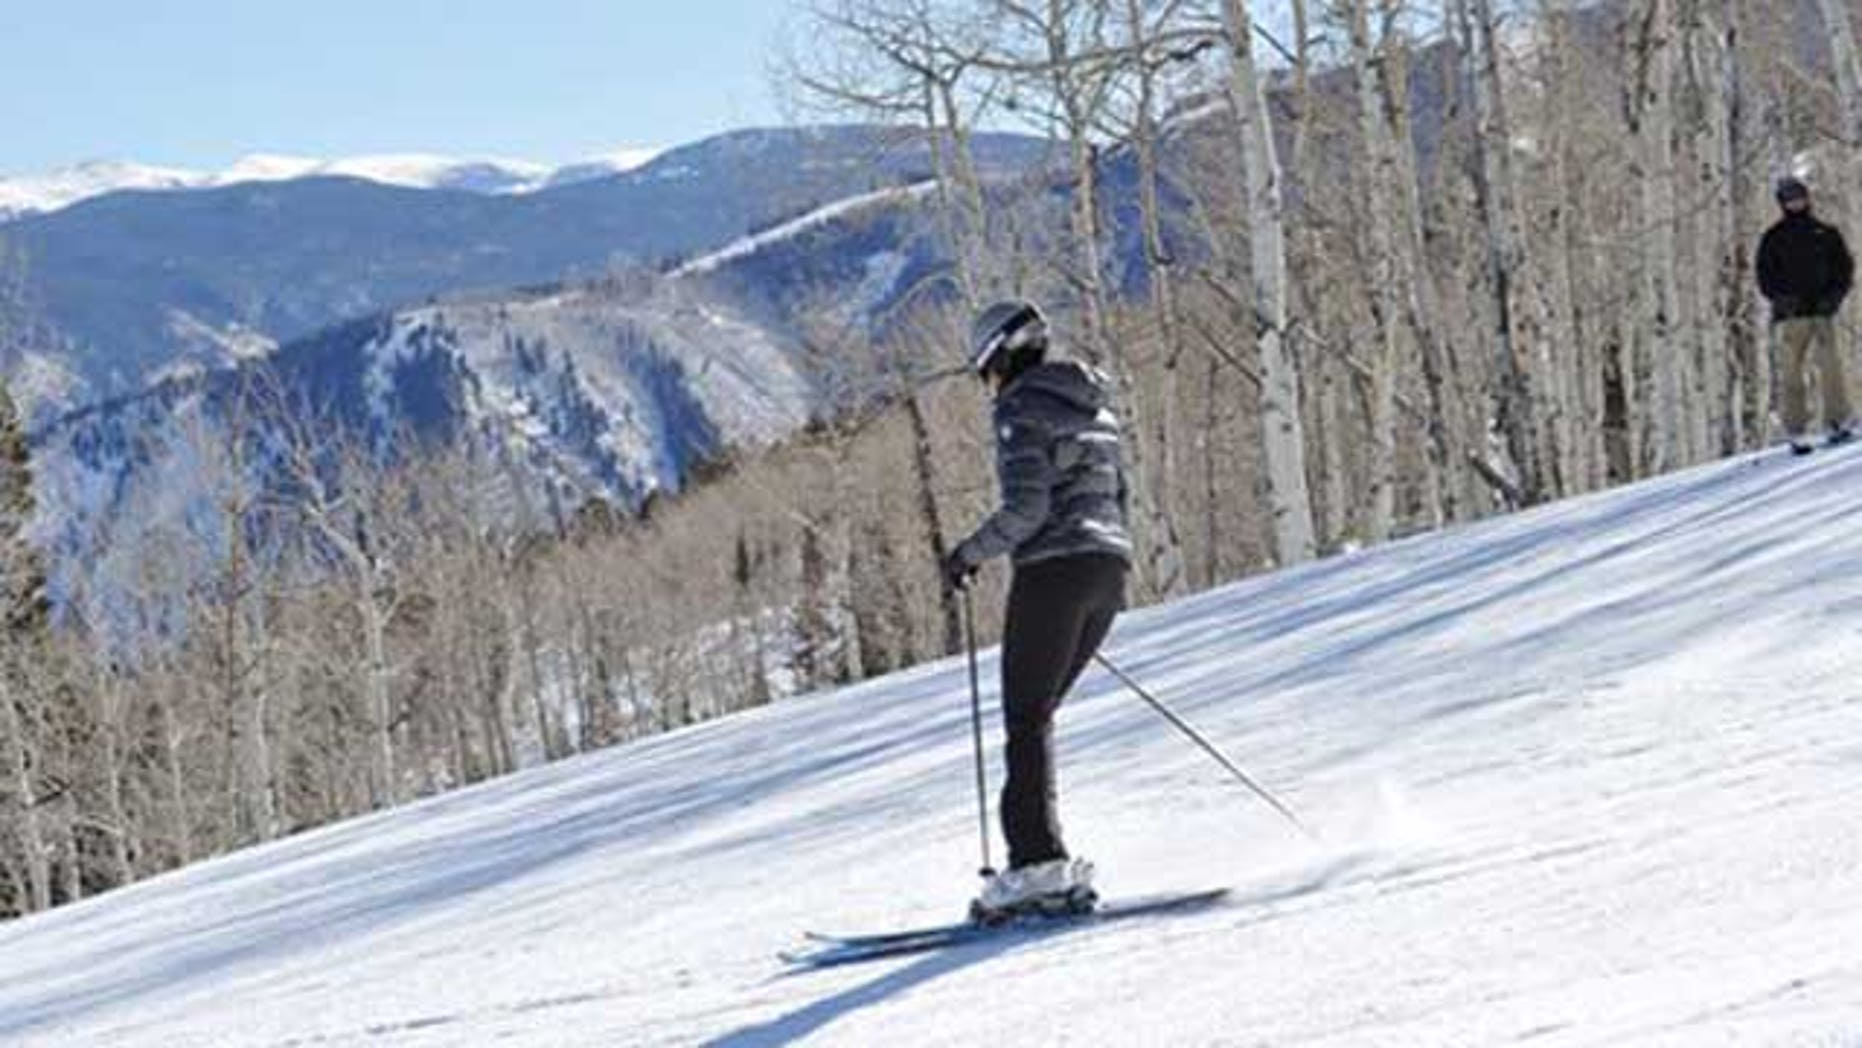 Feb. 18, 2012: First lady Michelle Obama skis at Buttermilk ski area in Aspen.